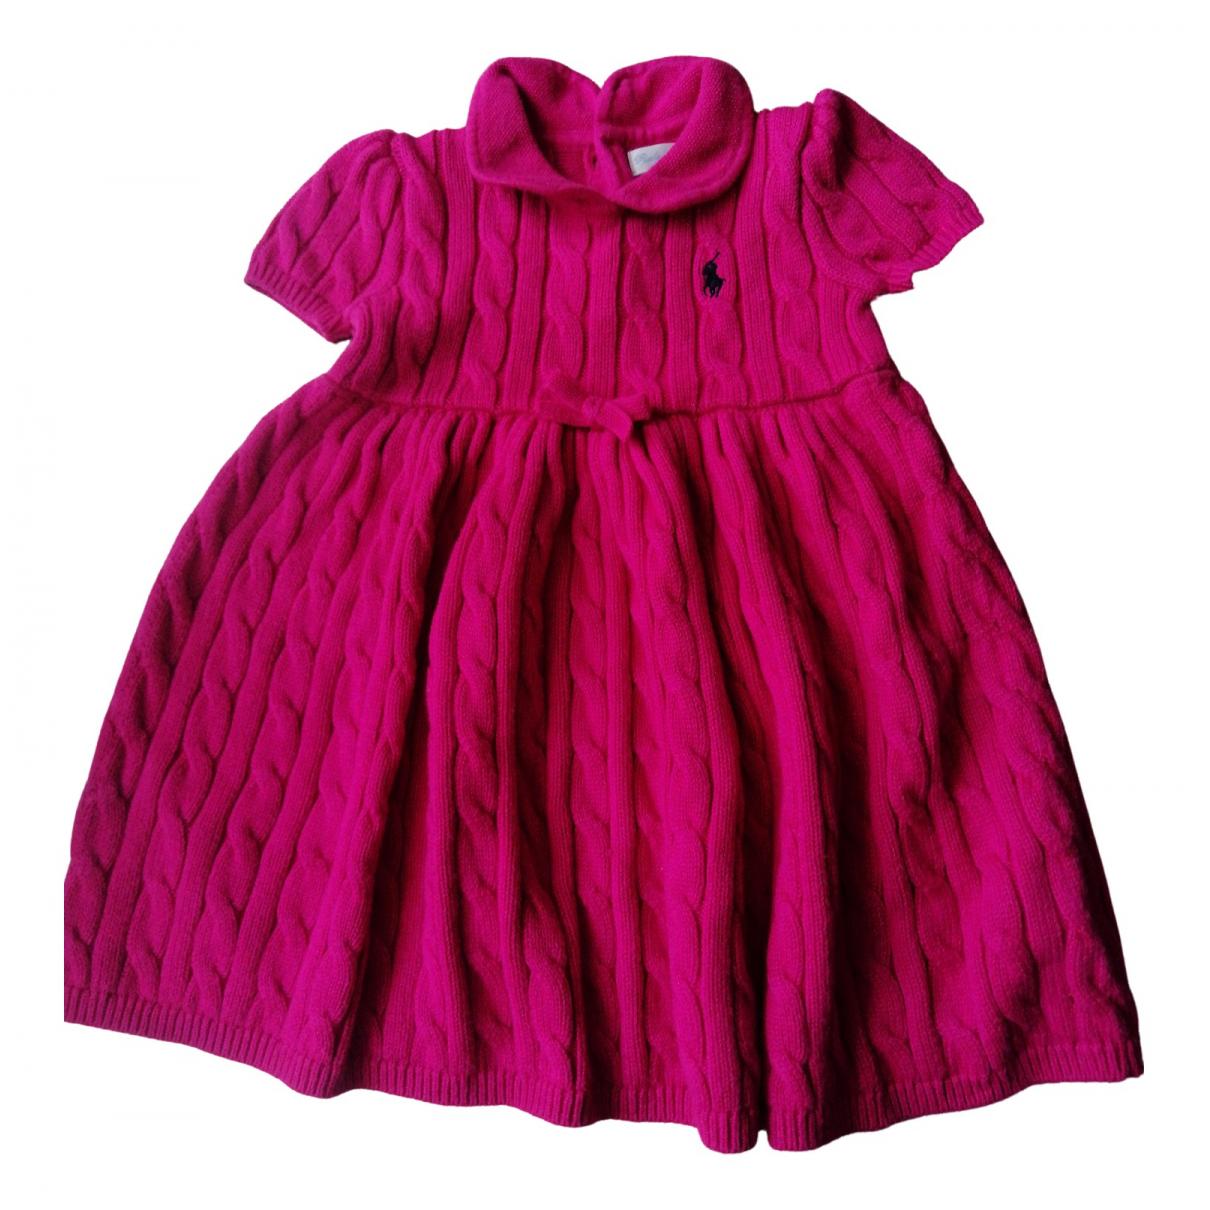 Ralph Lauren \N Pink Cotton dress for Kids 9 months - until 28 inches UK